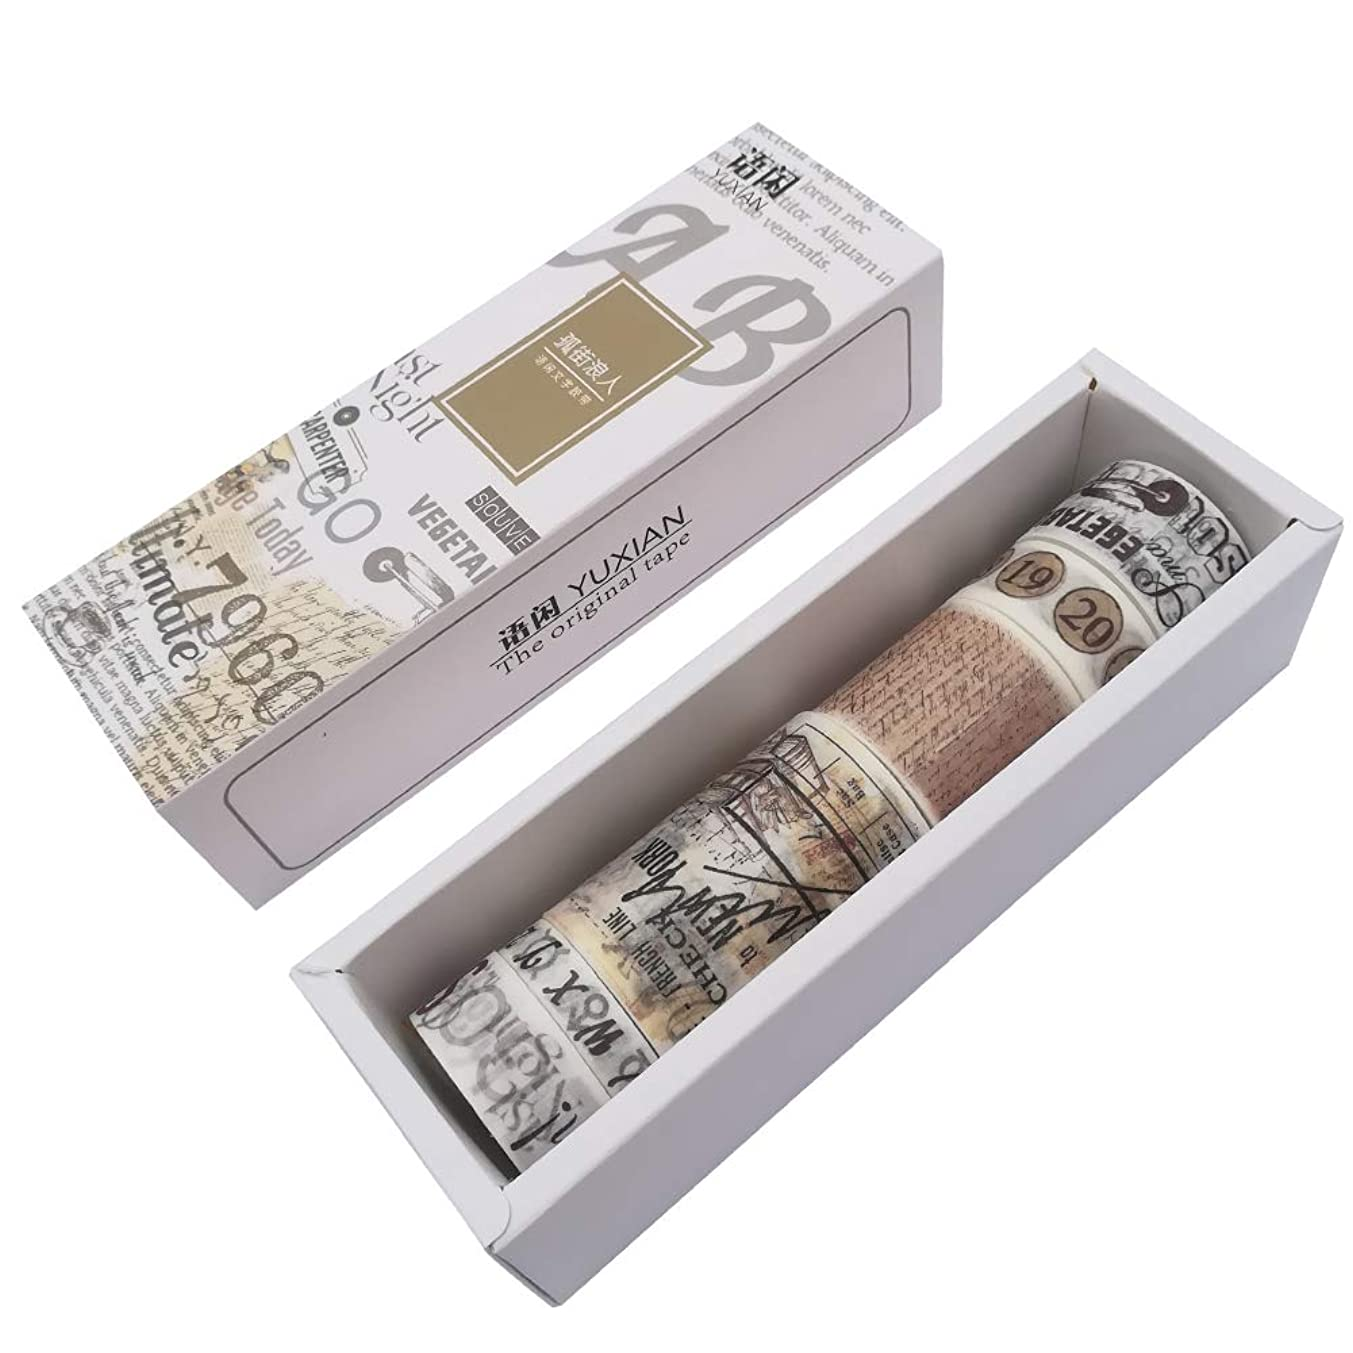 6 Rolls Kawaii Washi Masking Tape Set DIY Craft Scrapbooking Diary Album Planner Journal Decorative Label School Stationery (B)